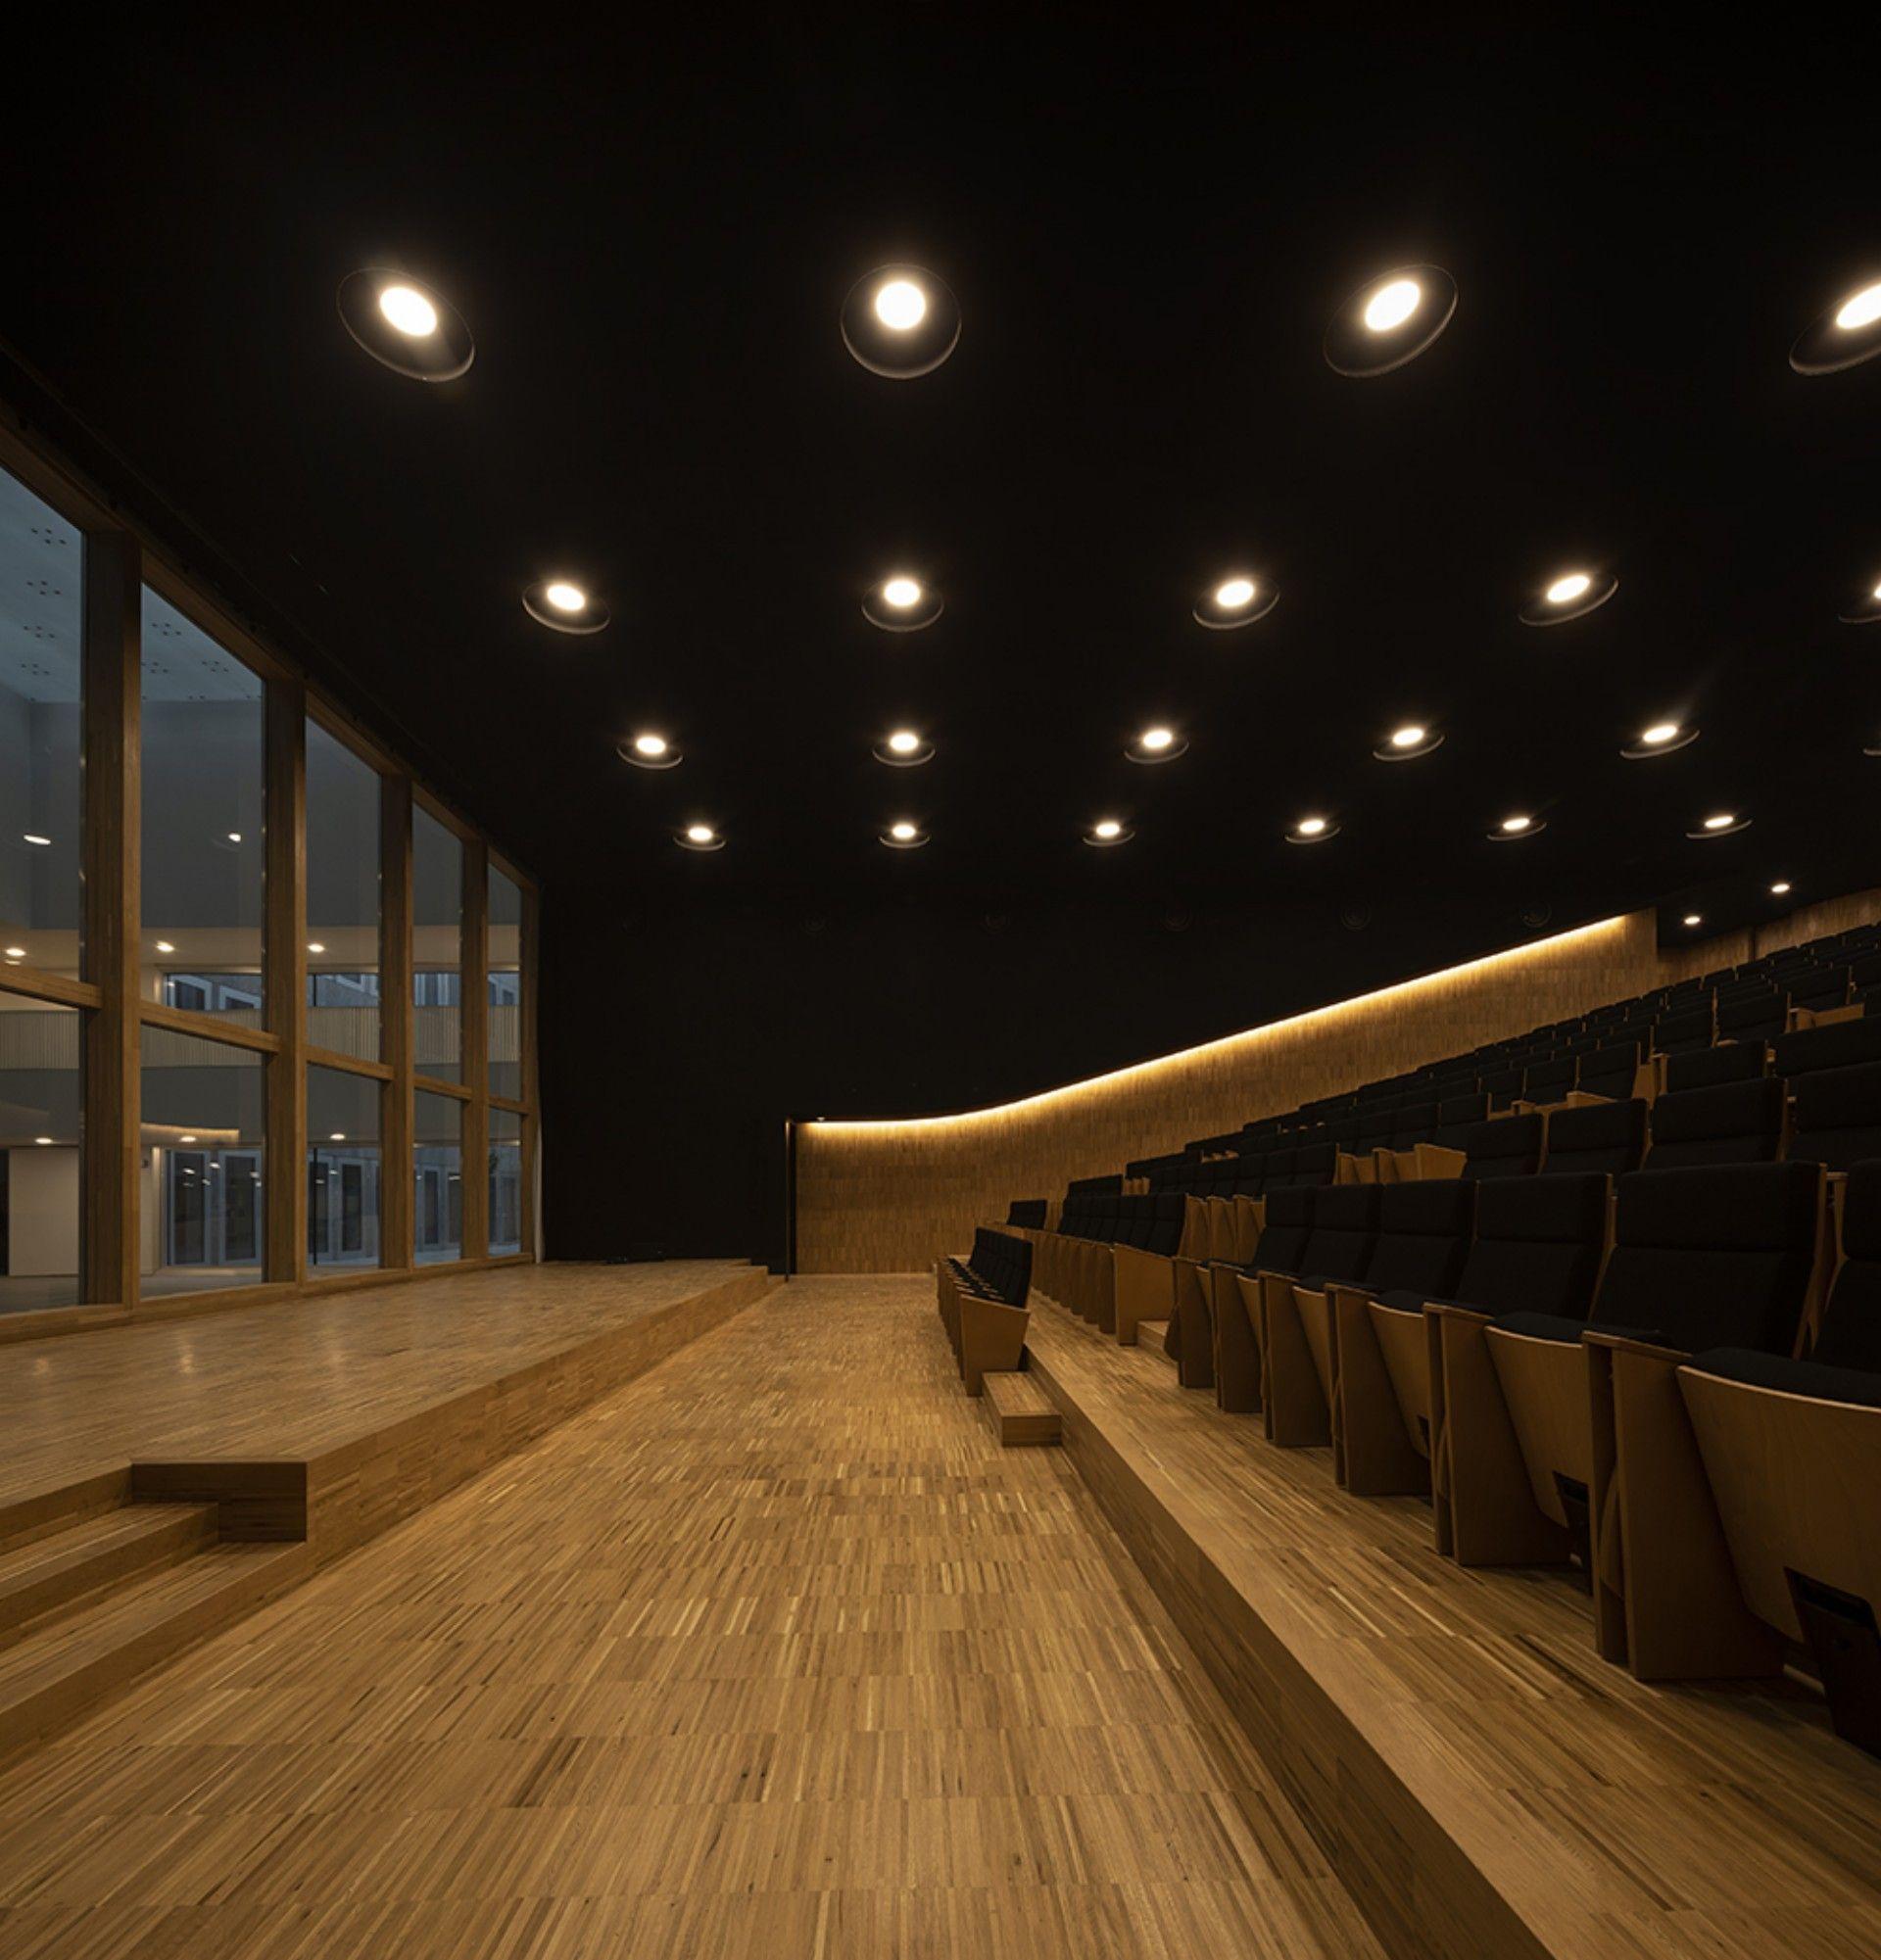 The Kaan And Pranlasdescours Firms Design The New Chambre De Metiers Et De L Artisanat In Lille Floornature Glass Facades Architecture Patio Flooring